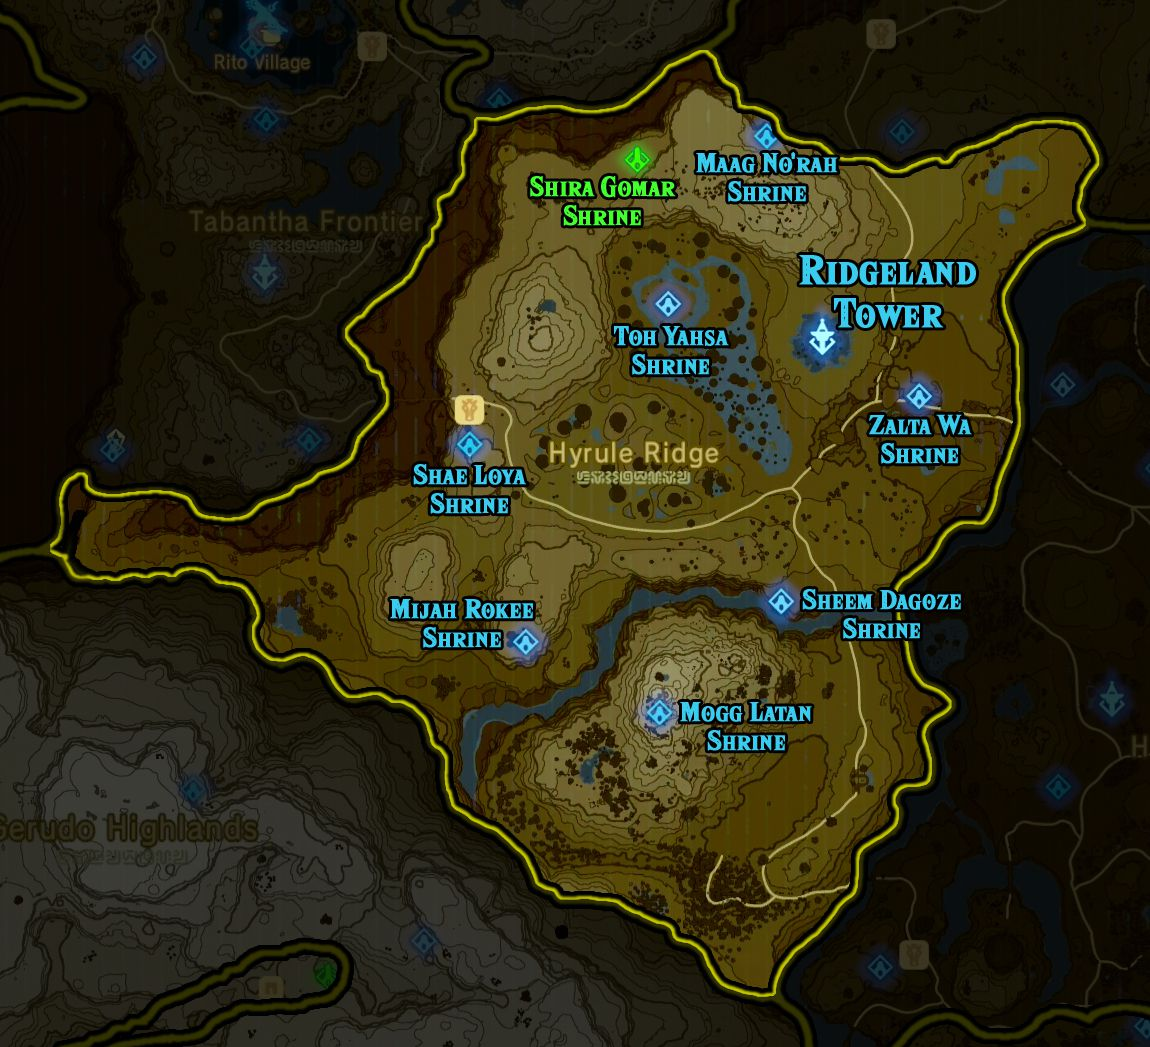 Zelda: Breath of the Wild shrine maps and locations - Polygon